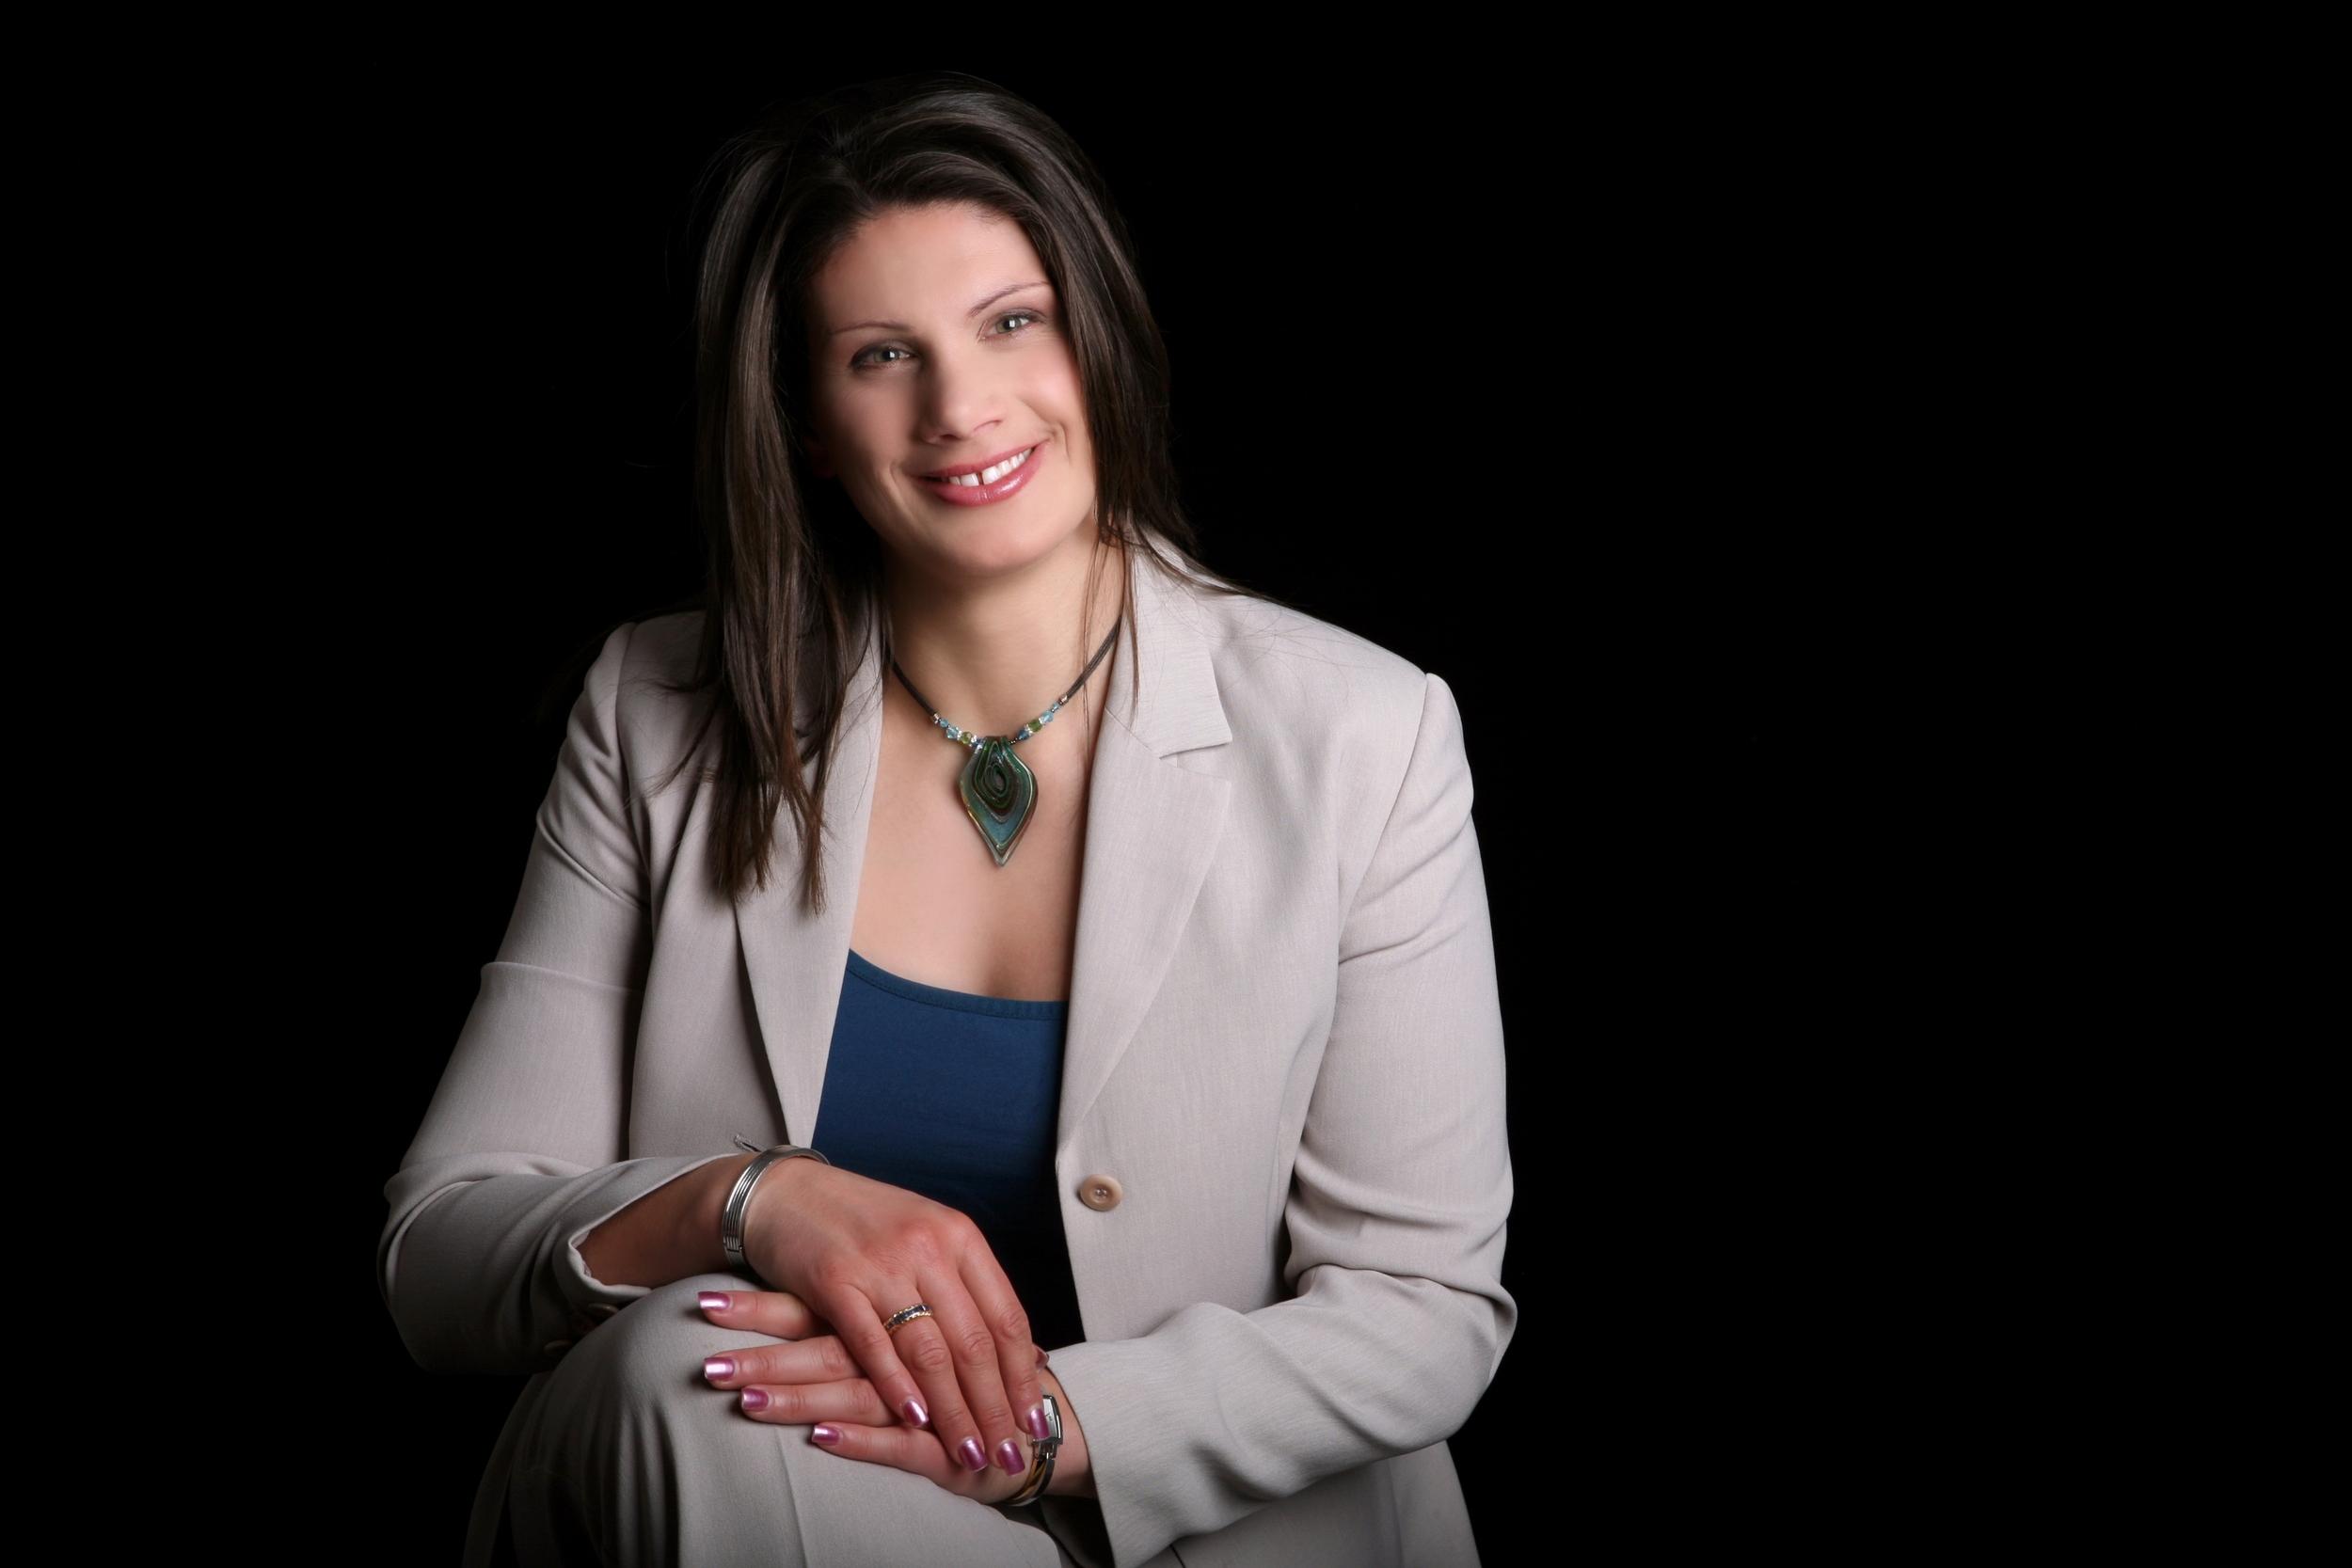 Dr. Elizabeth Celi